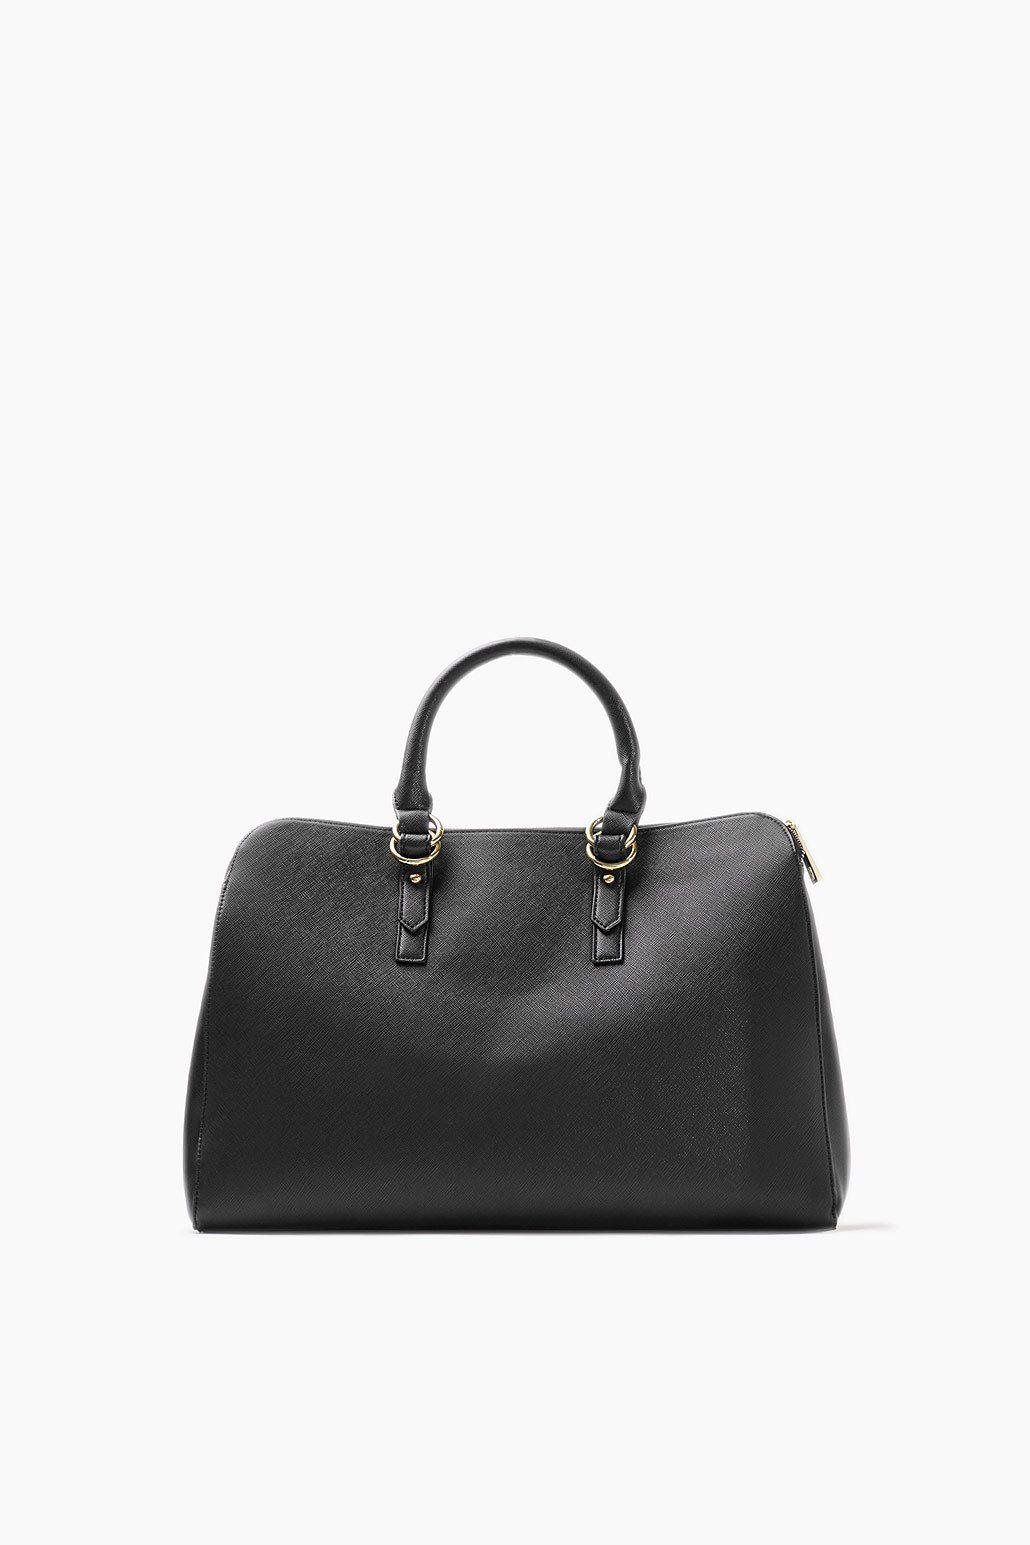 ESPRIT CASUAL Saffiano Tote Bag mit gepolstertem Fach